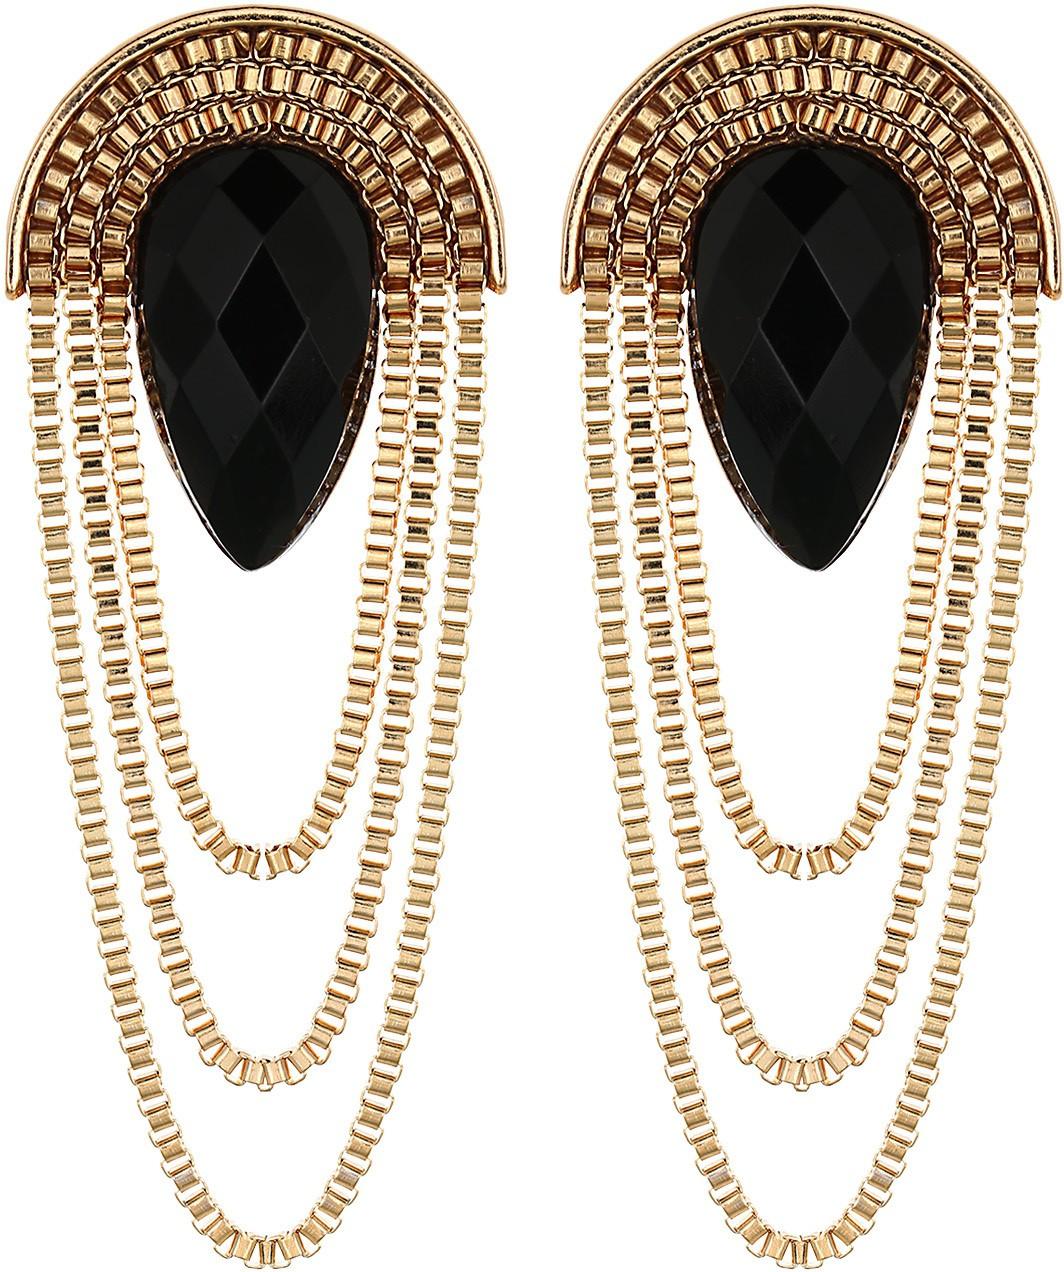 Deals - Delhi - Rings, Pendants. <br> Mahi, Voylla<br> Category - jewellery<br> Business - Flipkart.com